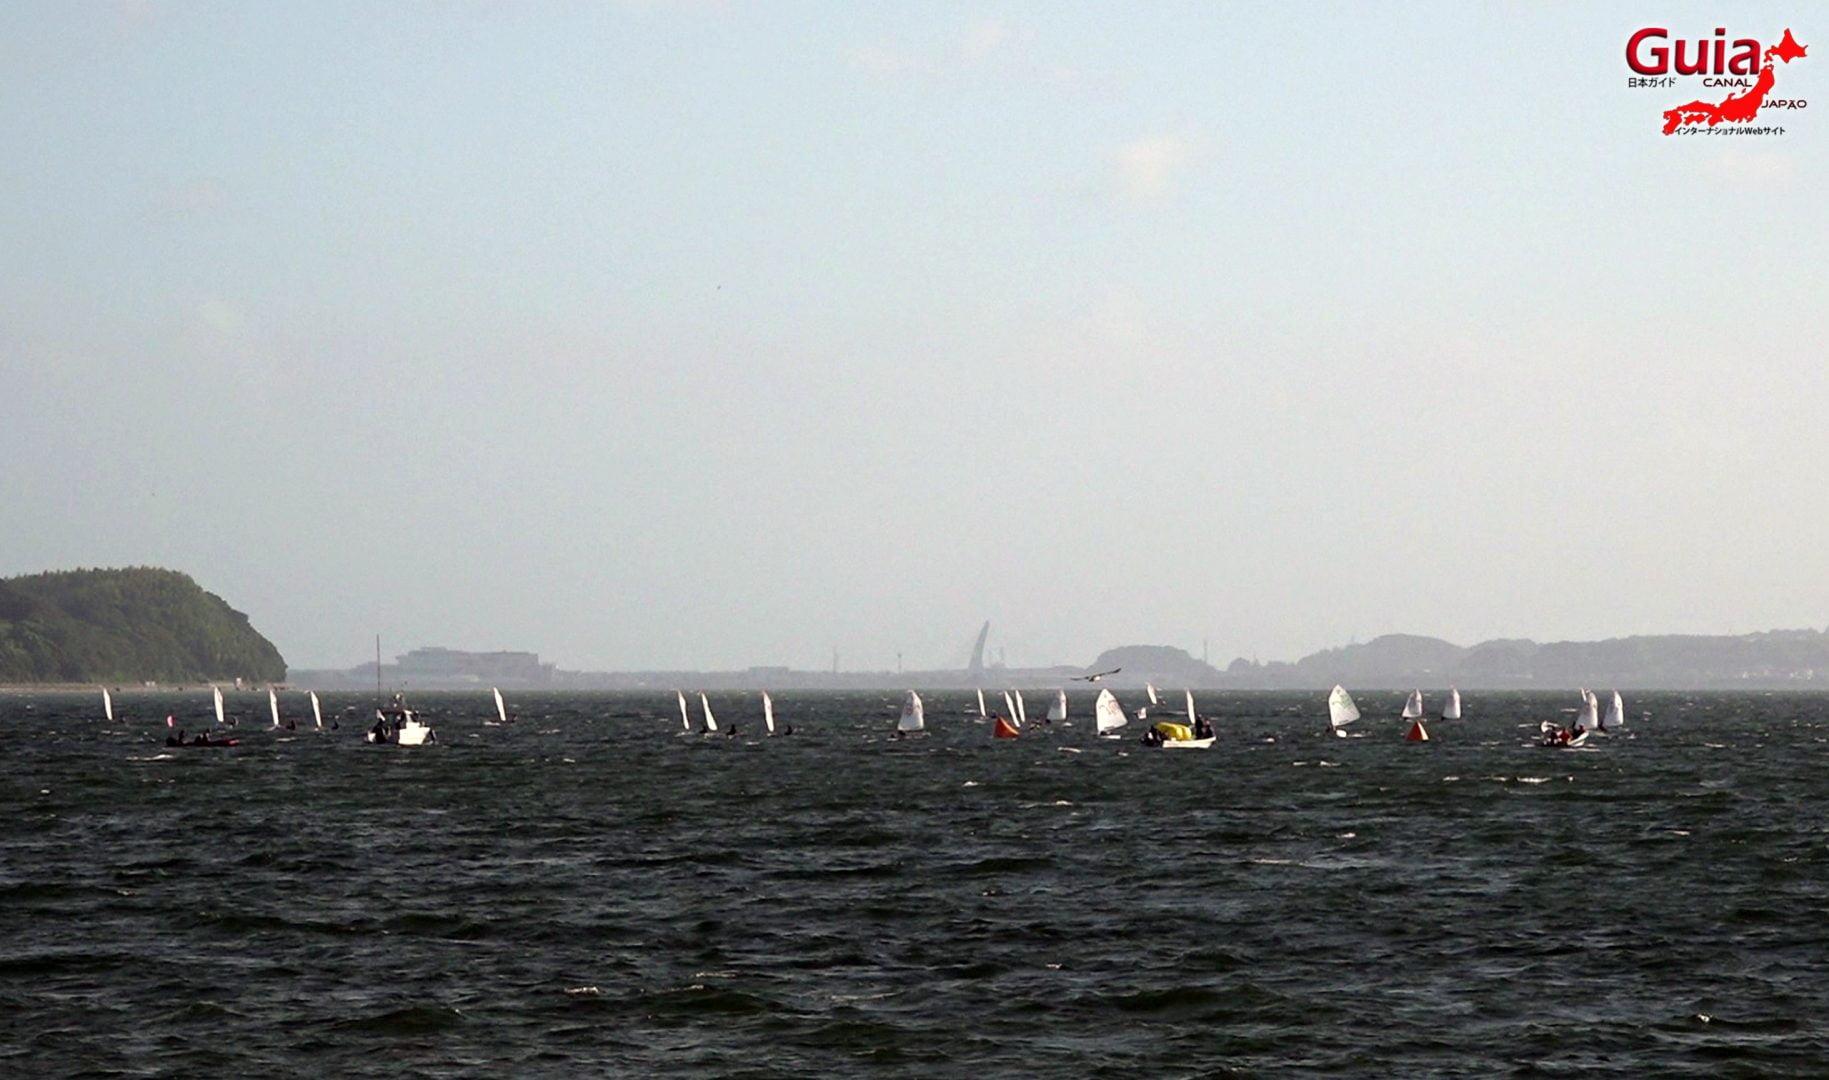 Navio de Cruzeiro do Lago Hamana de Hamanako 8